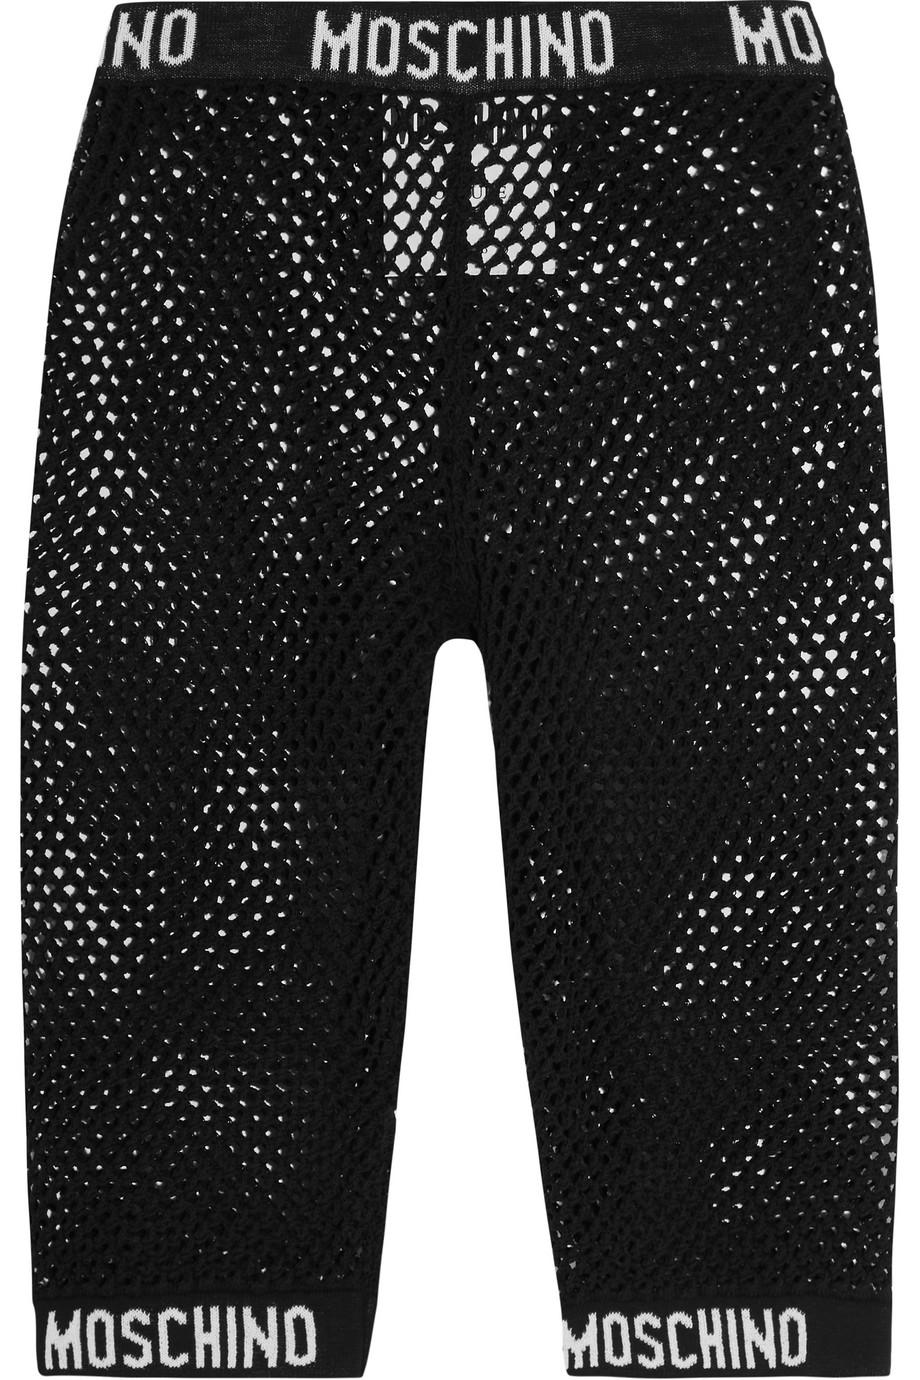 Moschino Cotton-Mesh Shorts, Black, Women's, Size: 38